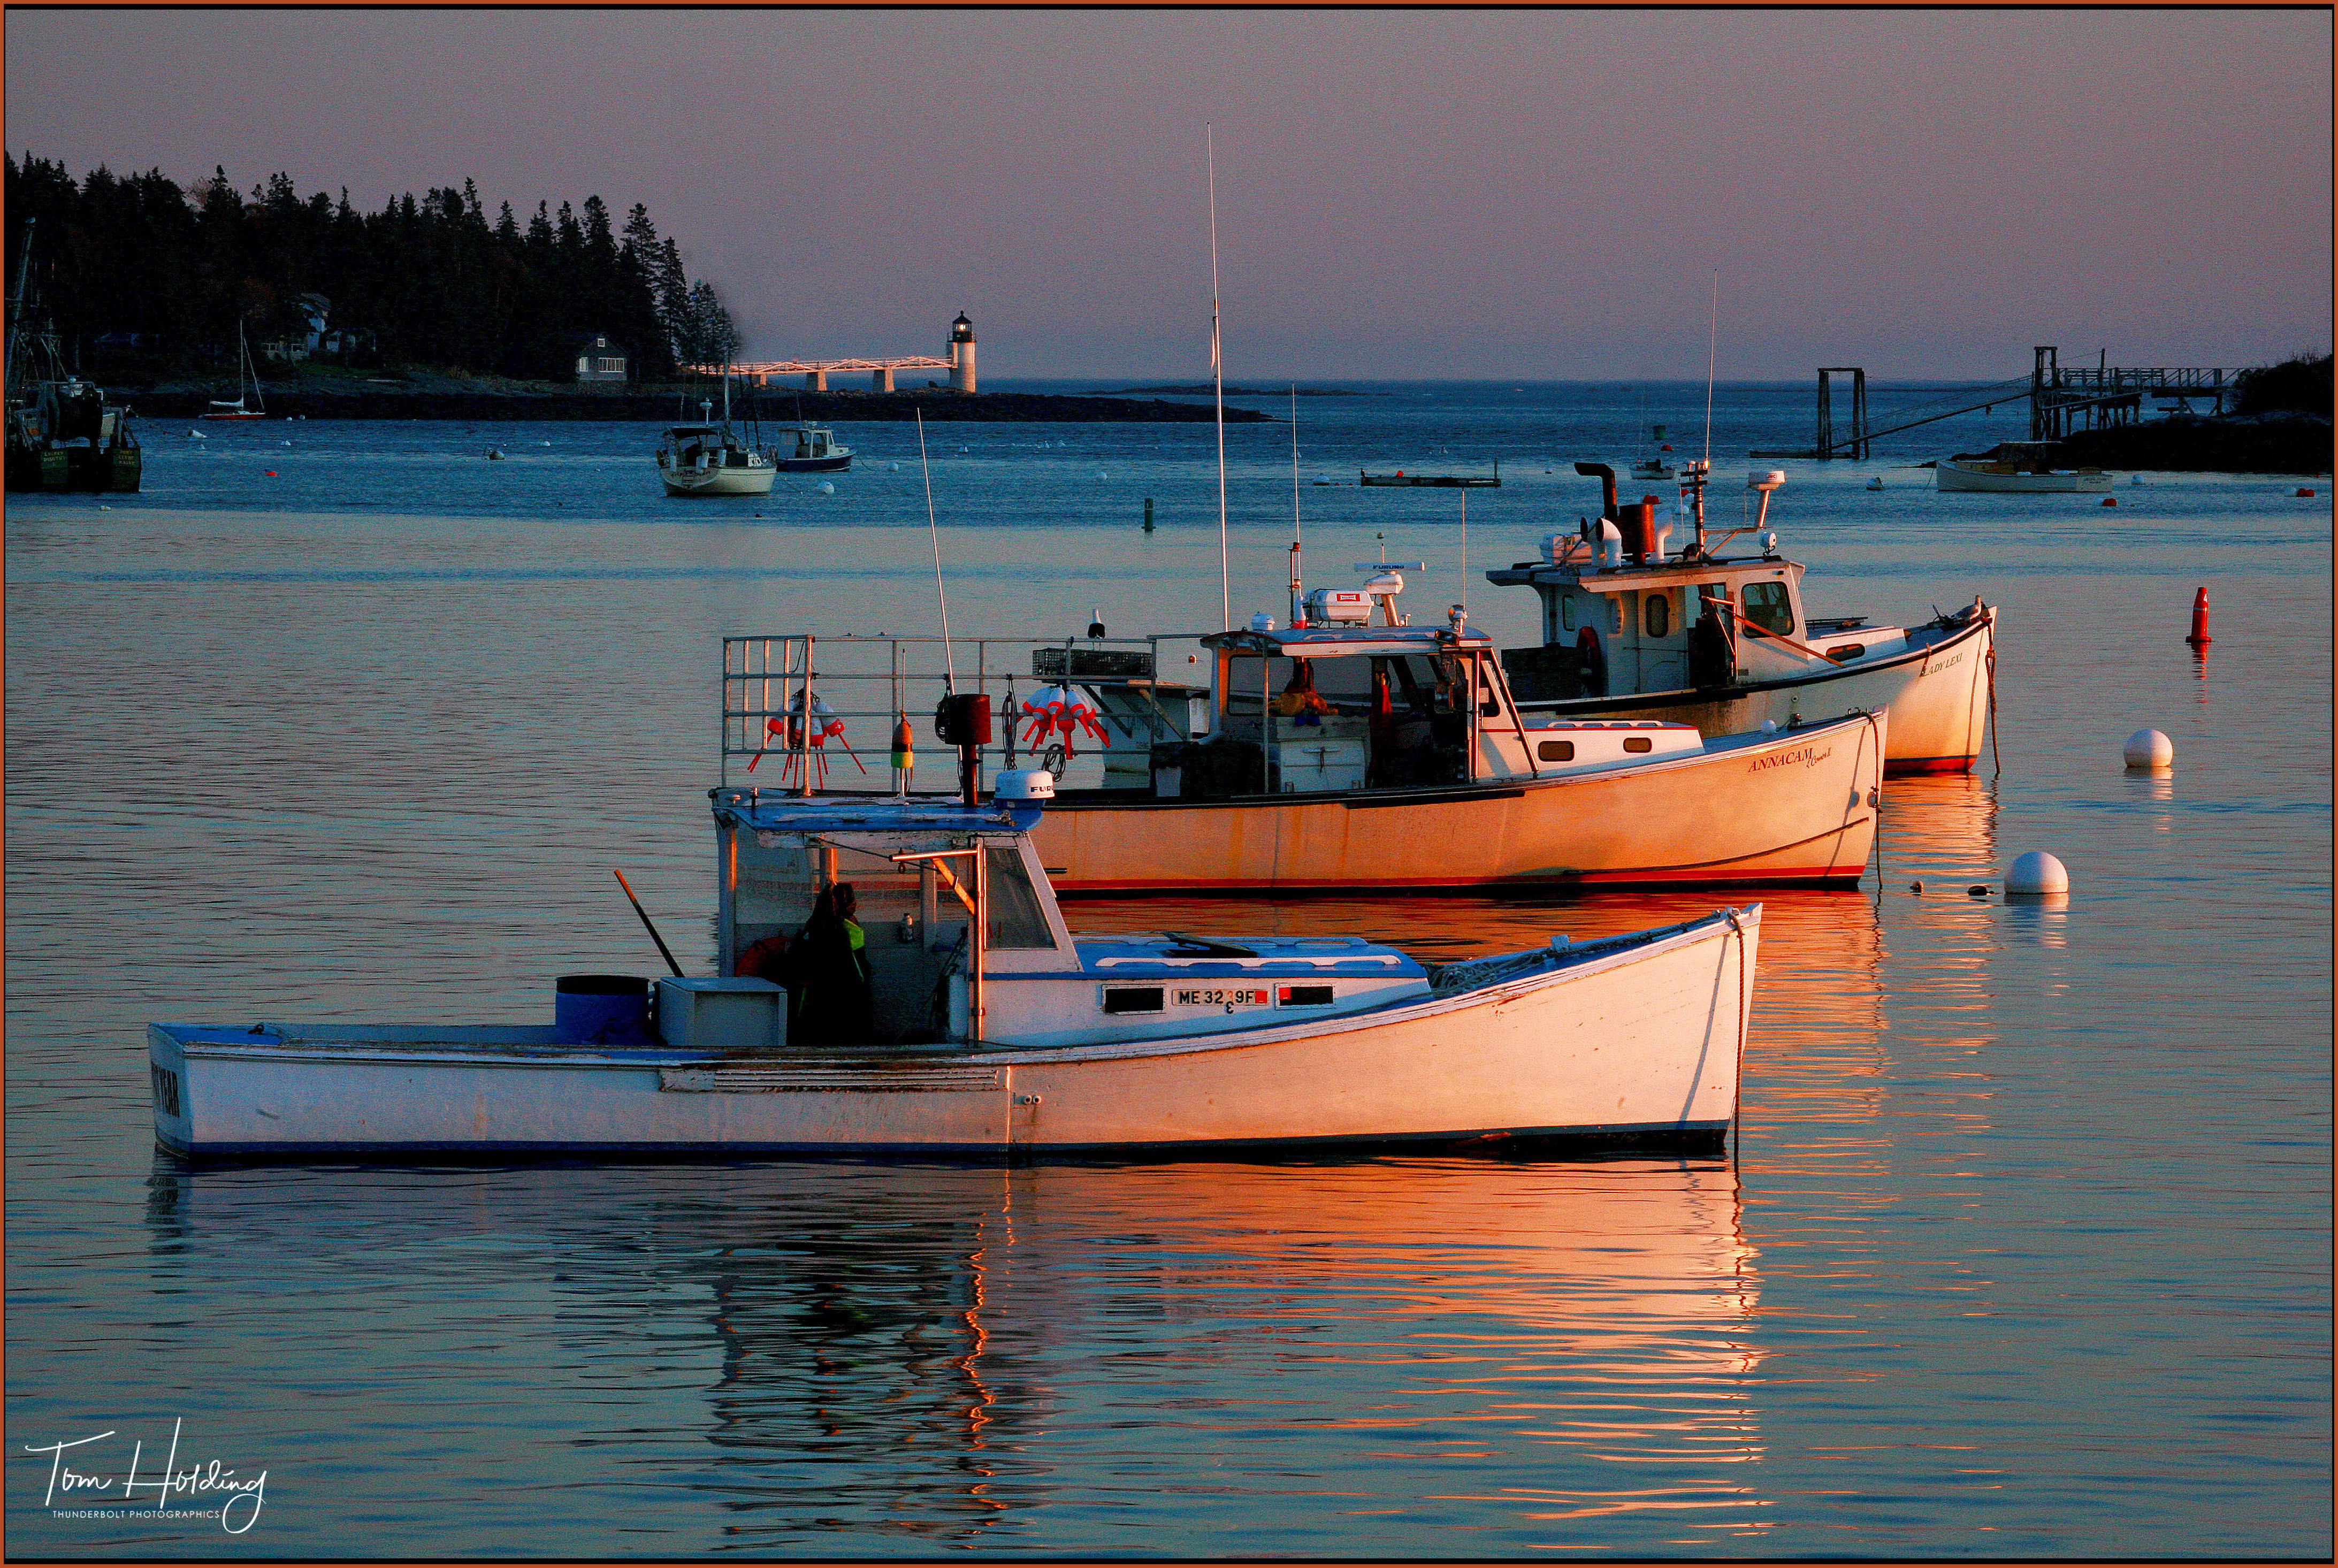 Lobster Boat Reflection